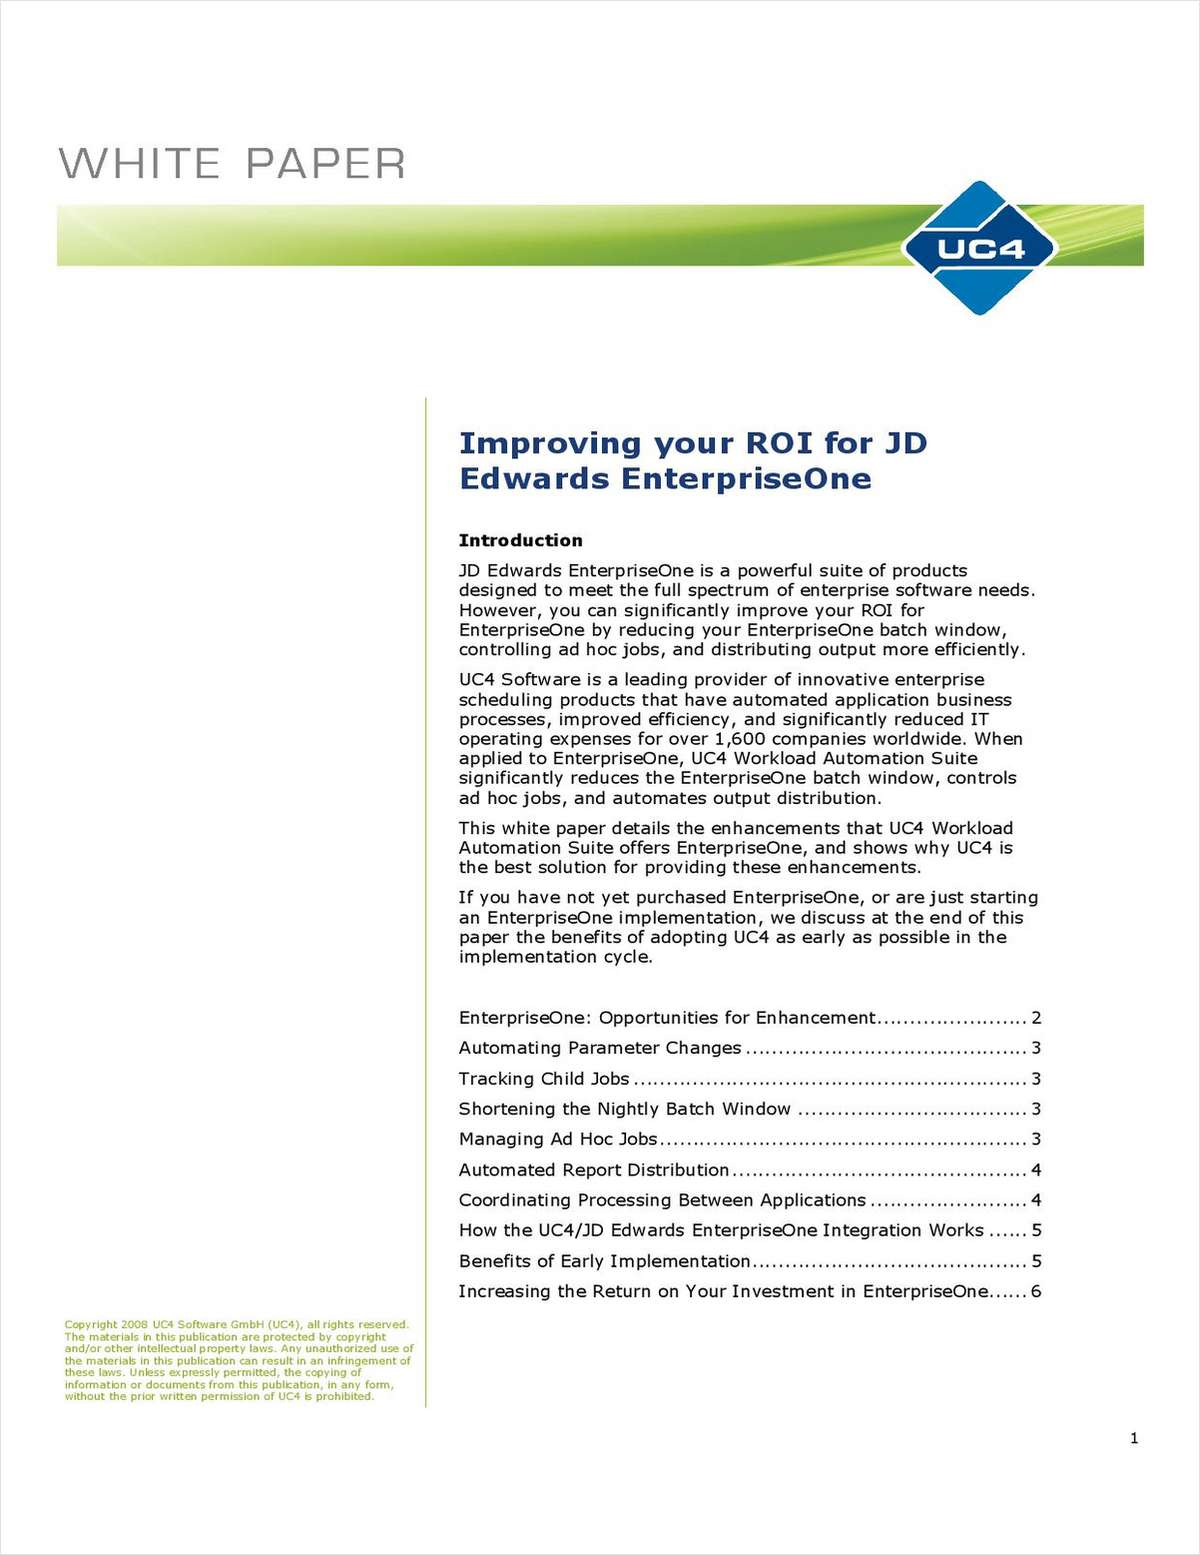 Improve your ROI for JD Edwards EnterpriseOne